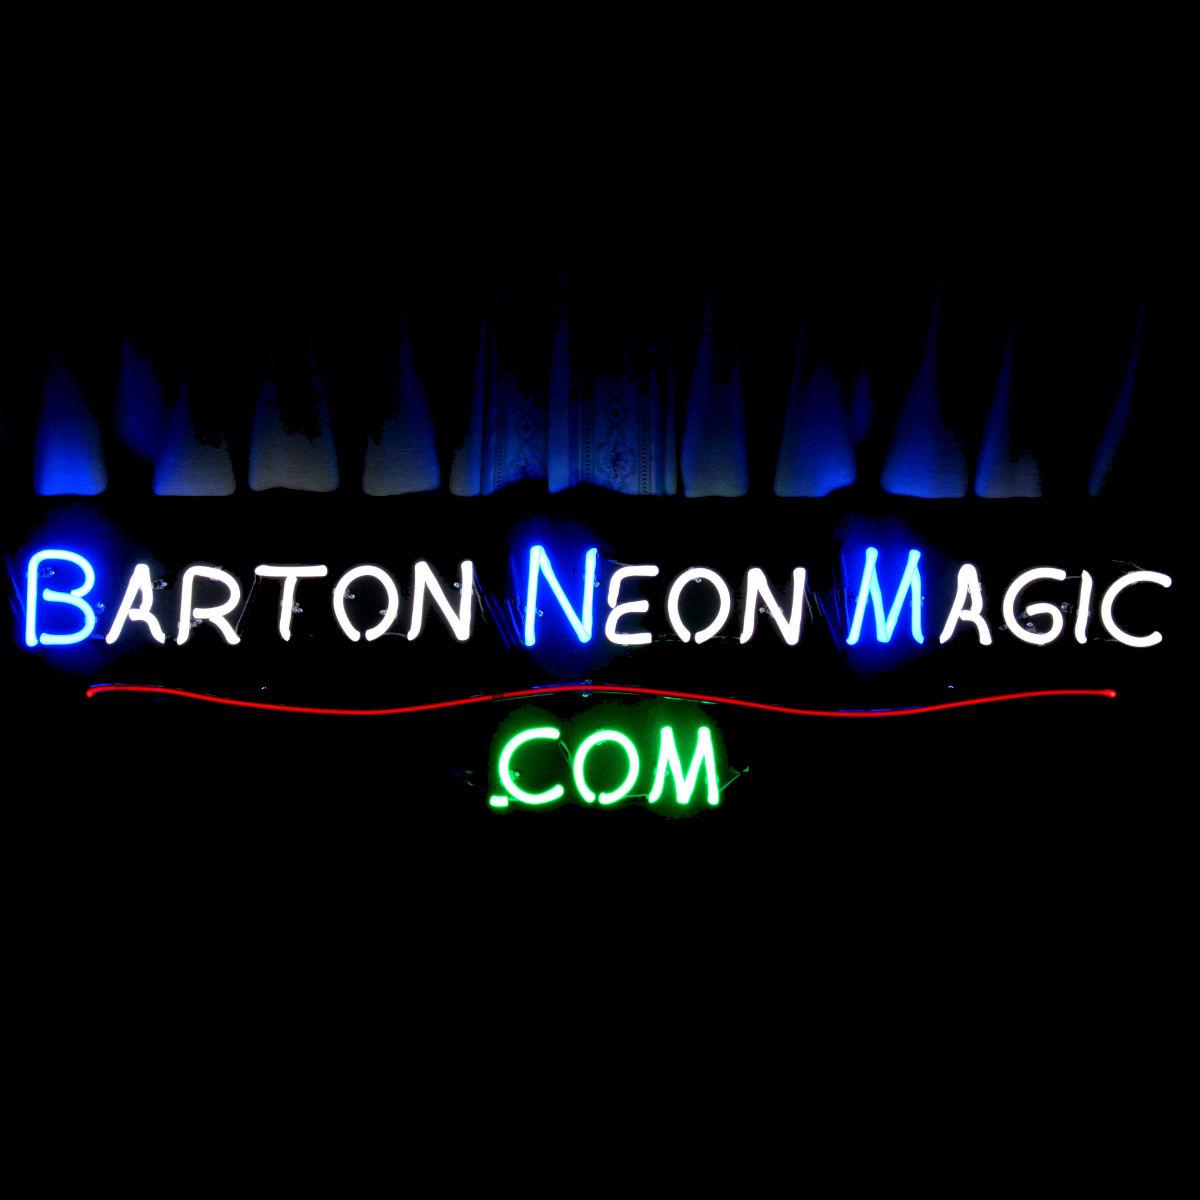 PACKARD NEON SIGNS - BartonNeonMagic.com